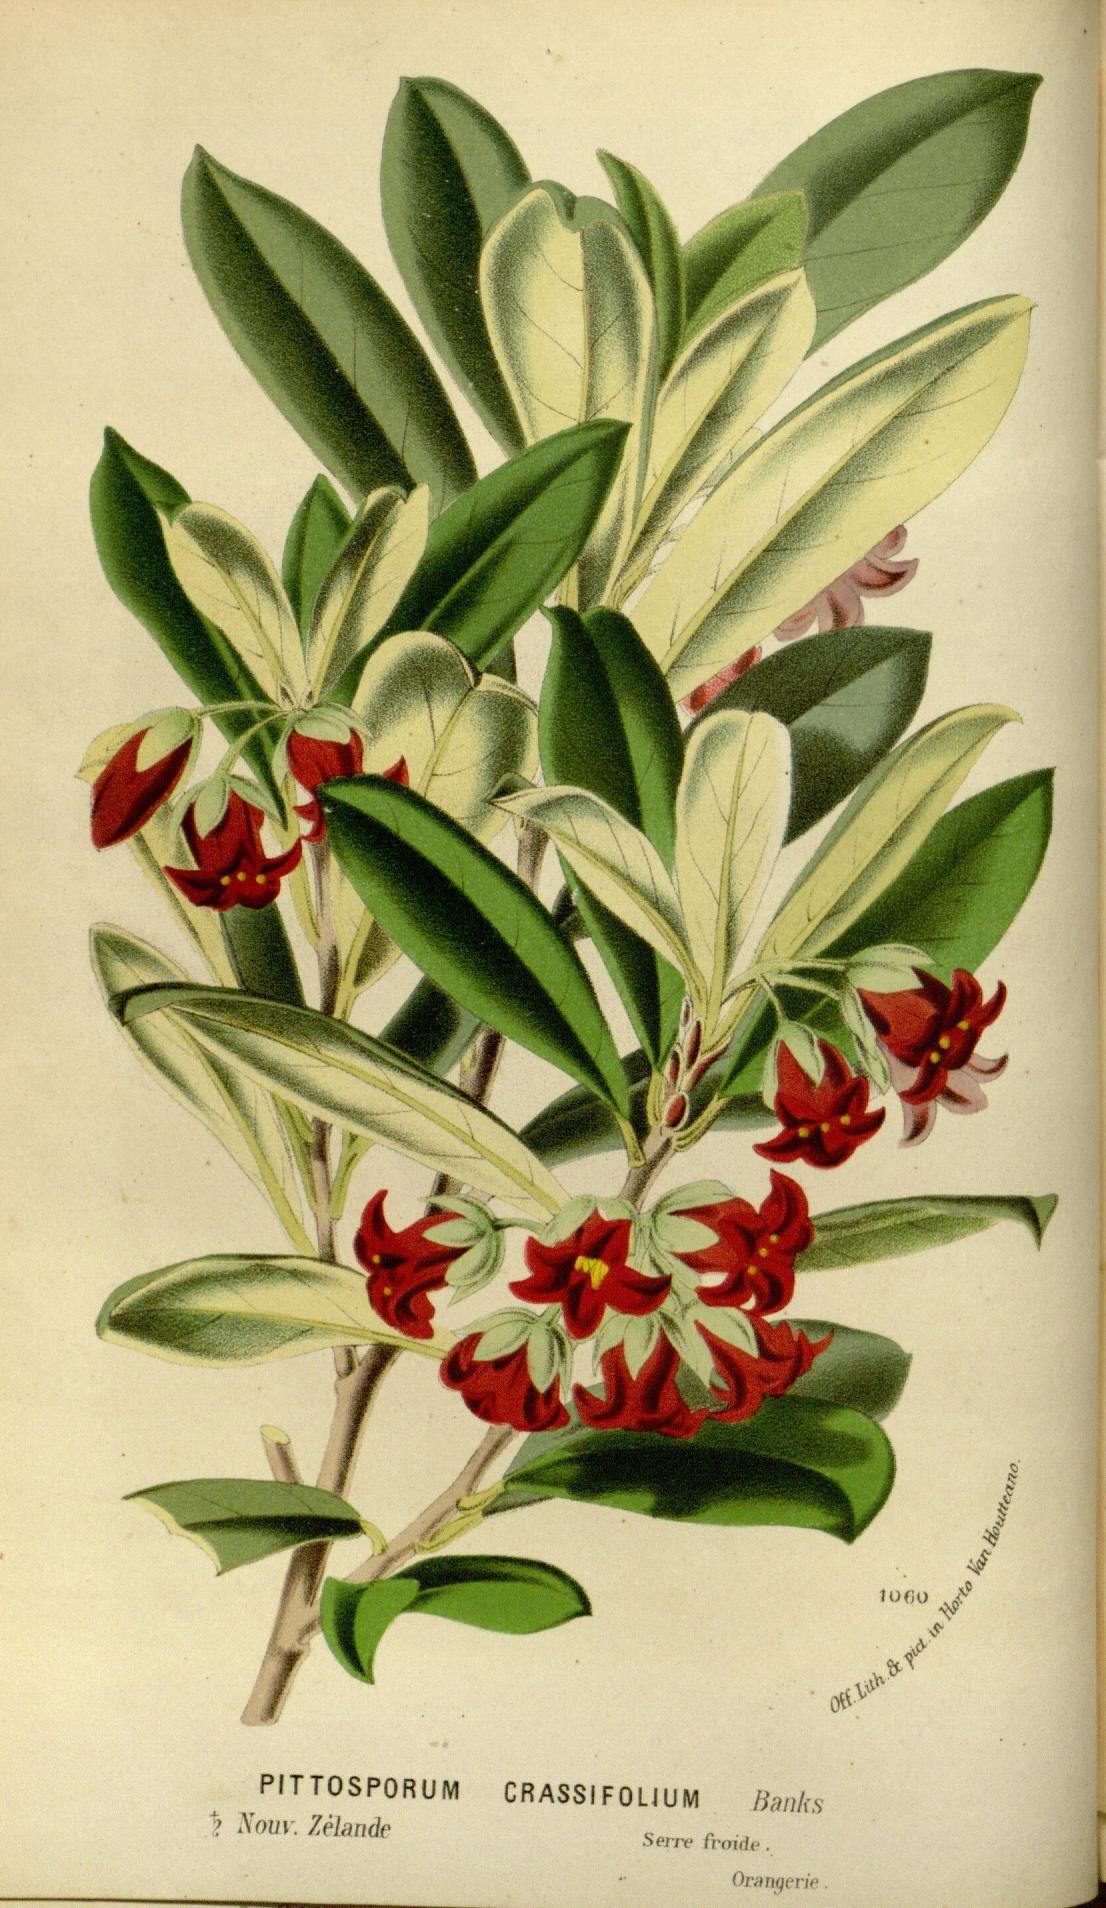 v.21 (1875) - Flore des serres et des jardins de l'Europe - Biodiversity Heritage Library